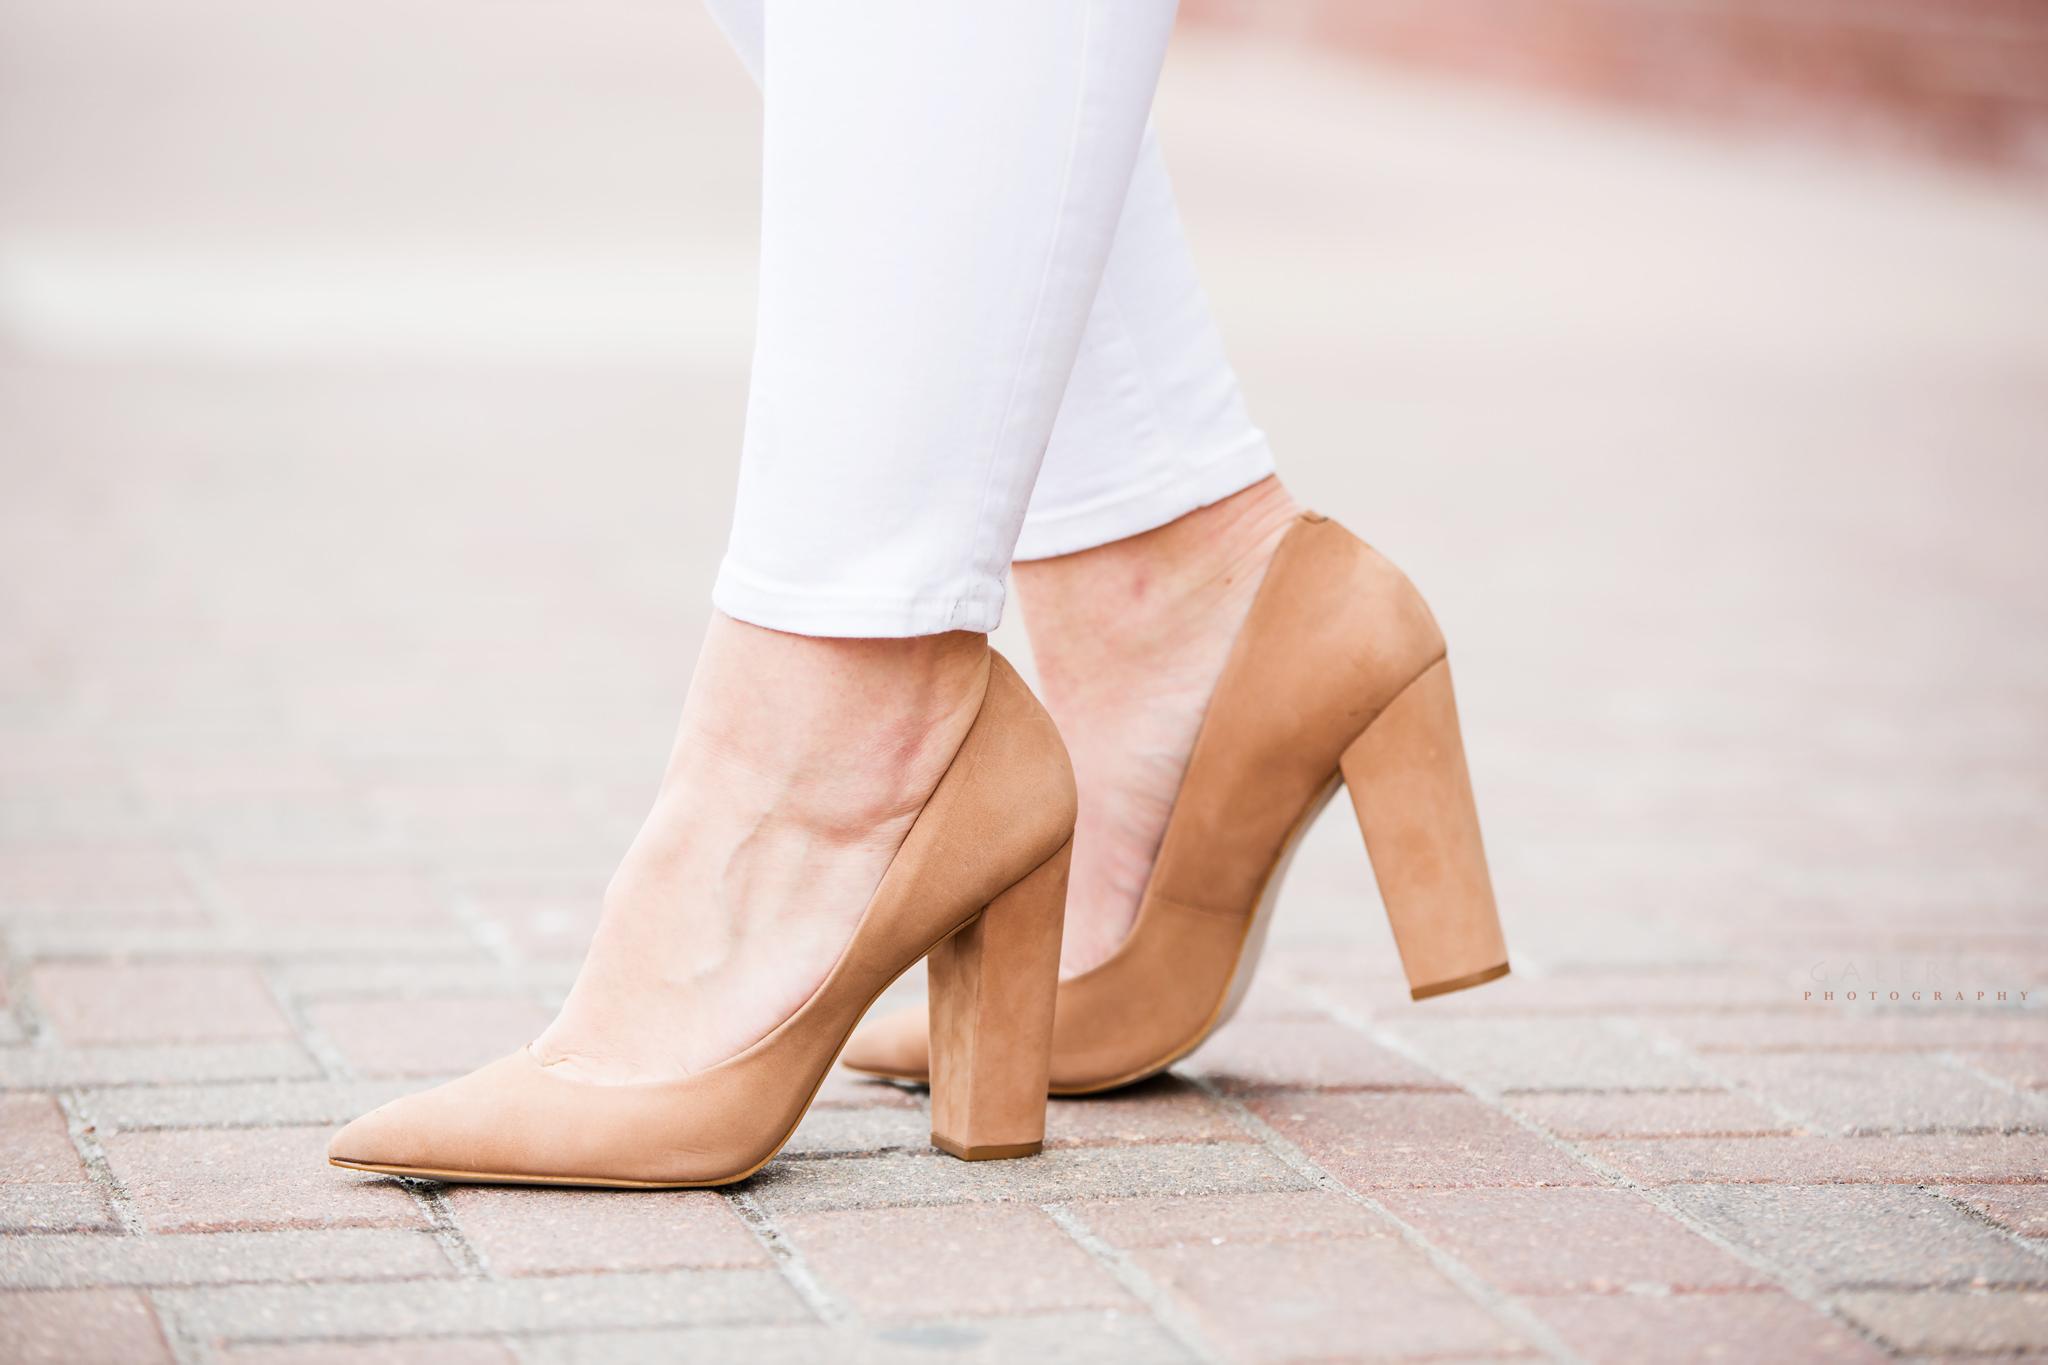 Raeann-Langas-Denver-Fashion-Blogger--white-pants-beige-sweater-GaleRisa-Photography-2016-42